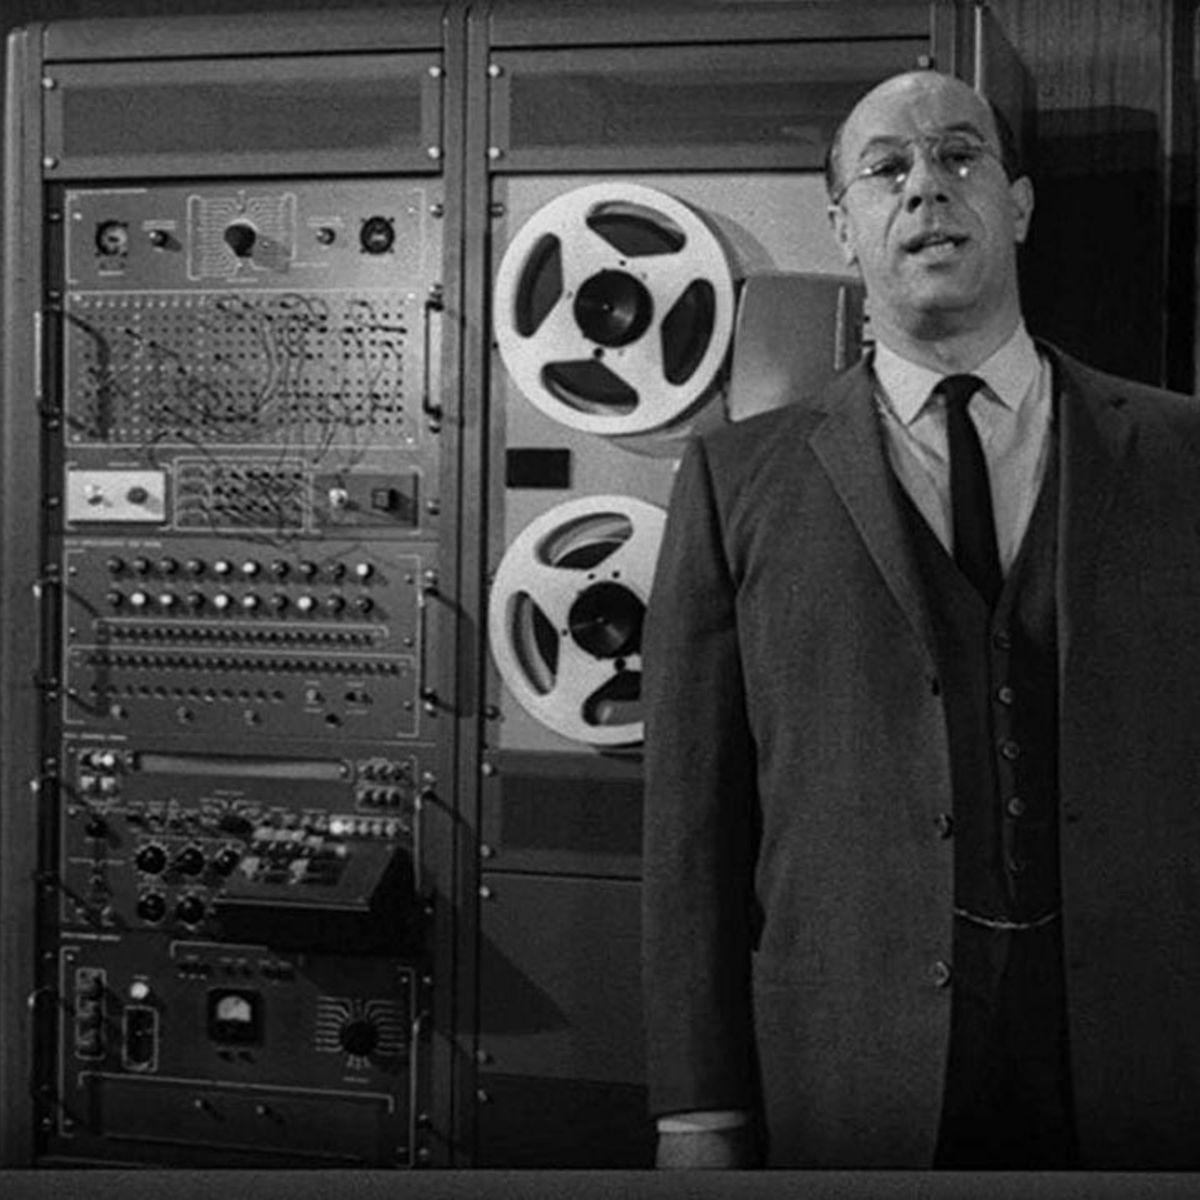 Twilight Zone The Brain Center at Whipple's hero